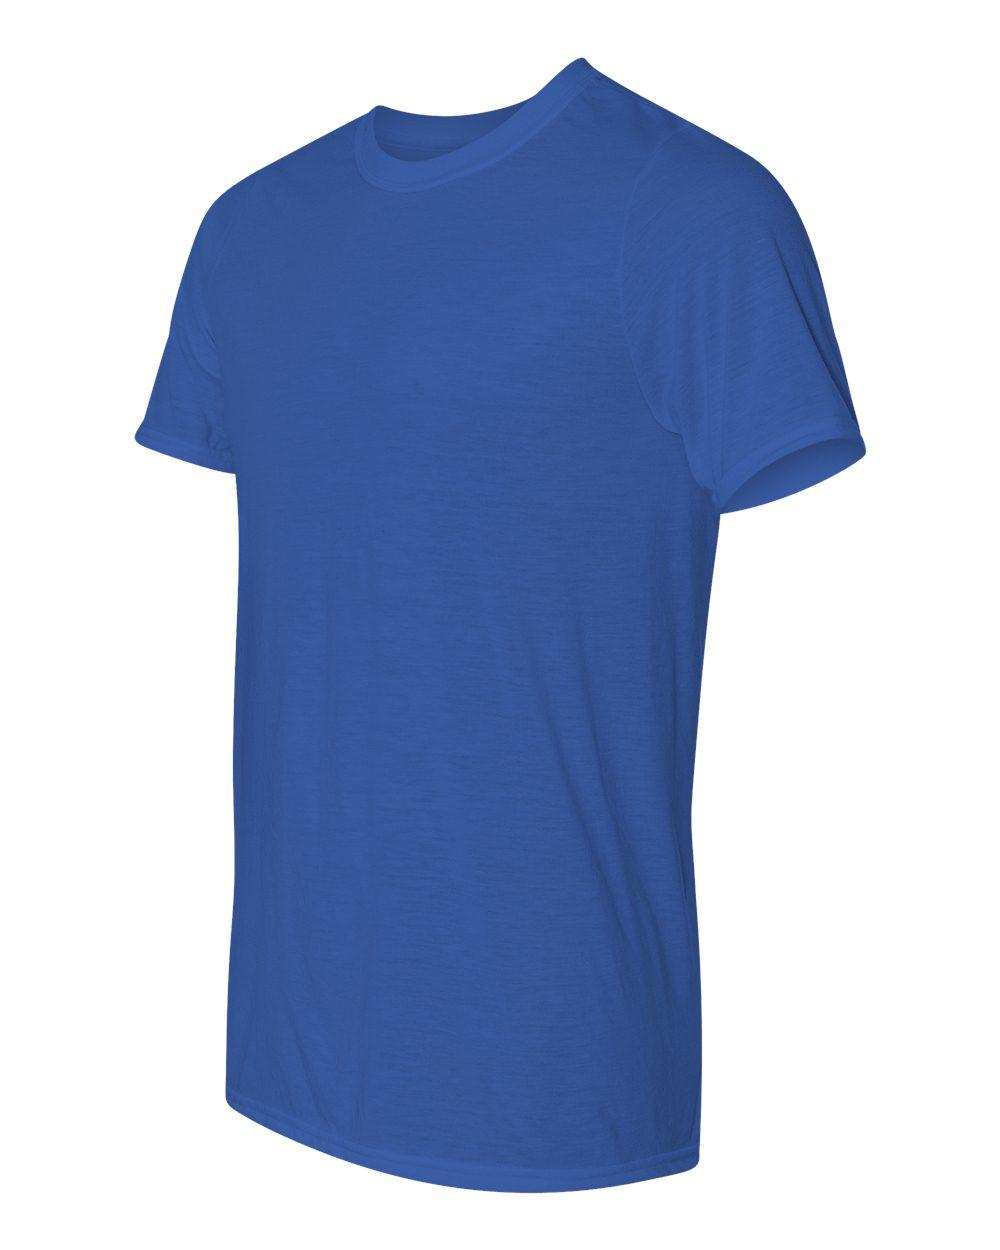 Gildan 42000 performance short sleeve t shirt friendly for Gildan t shirt printing